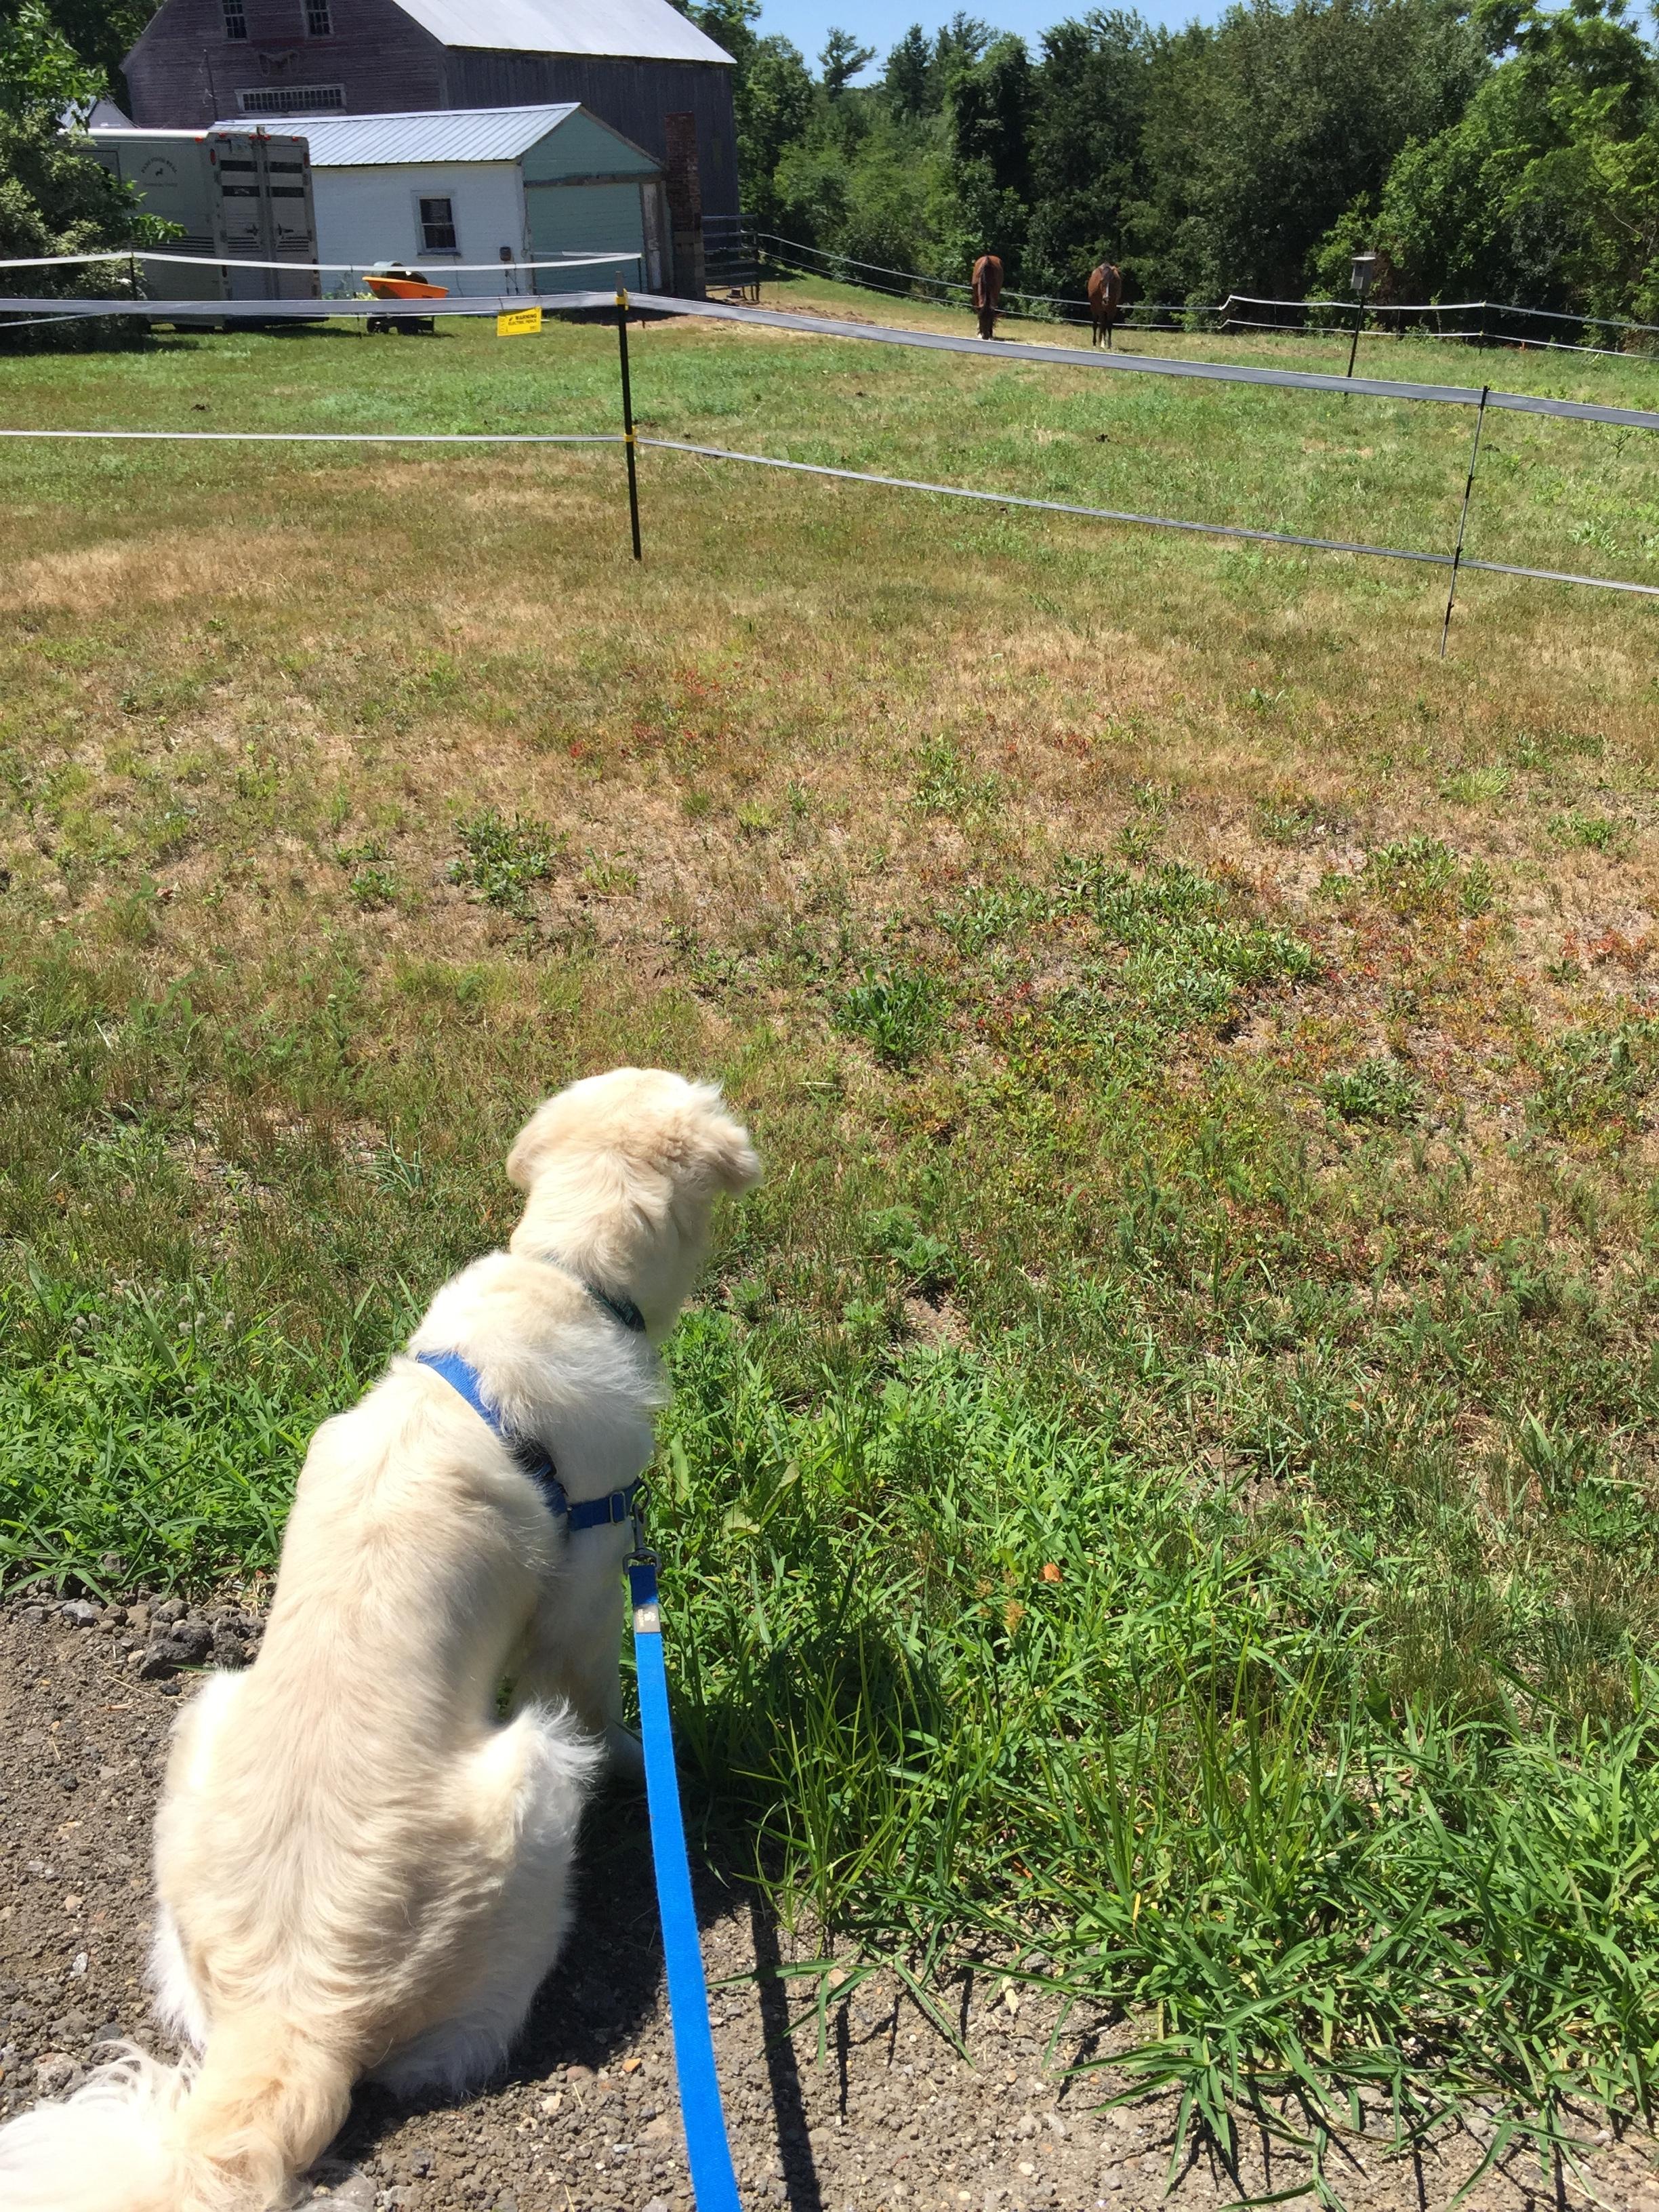 Homeward Bound Dog Walking Lakes Region, NH  Golden Retriever watching horses in the summer